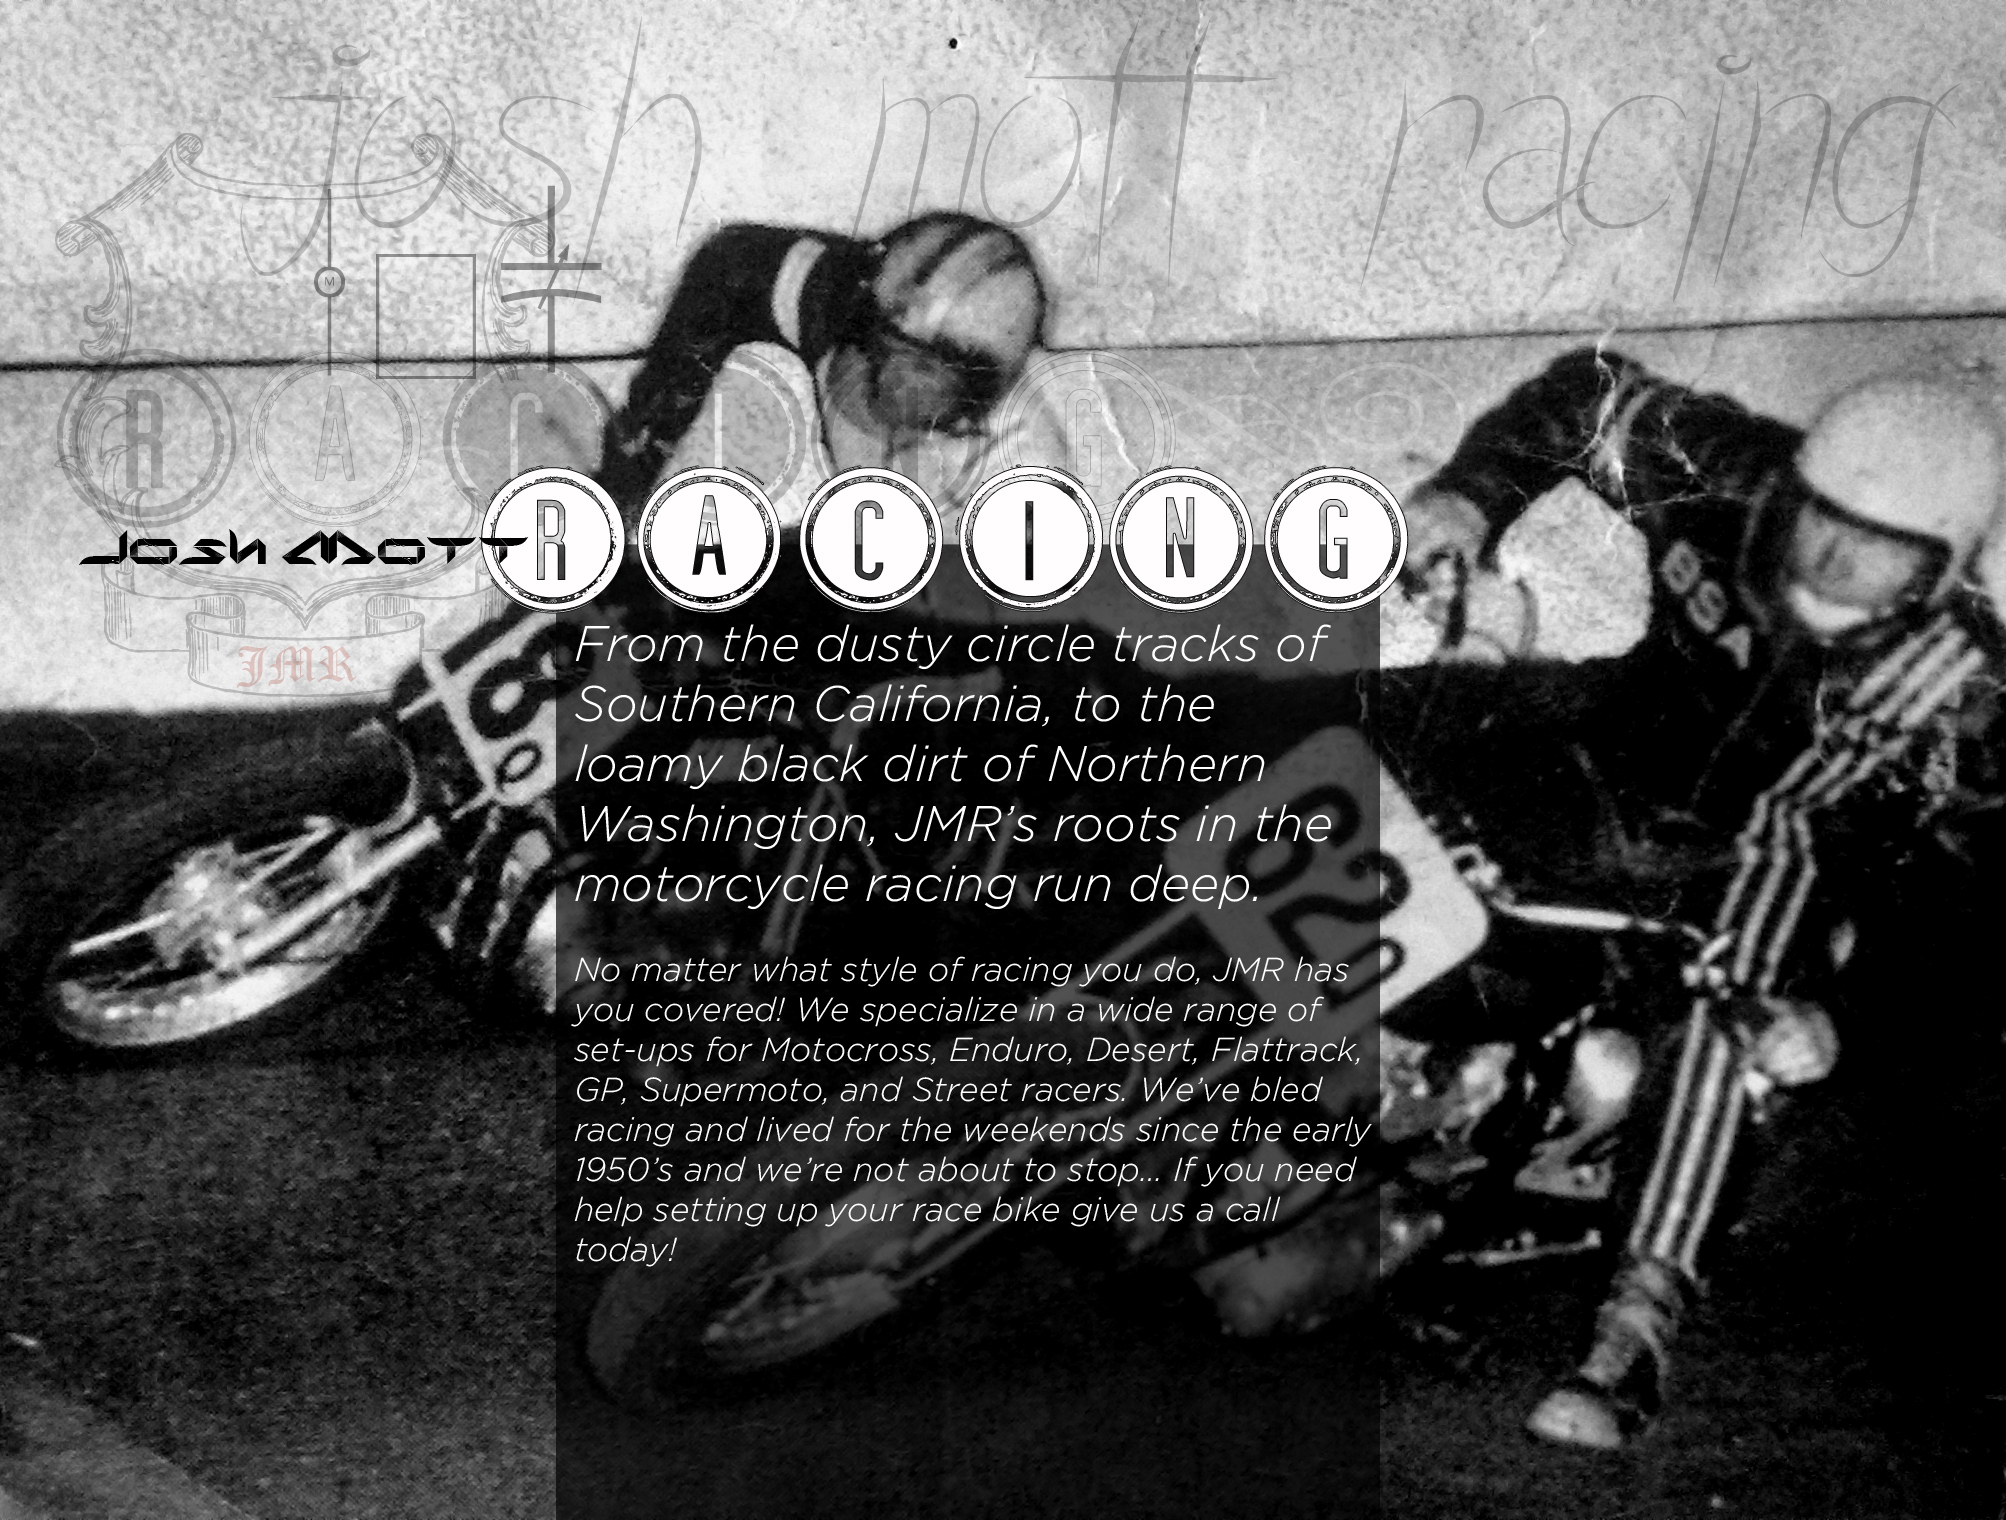 jmr-racing2.jpg